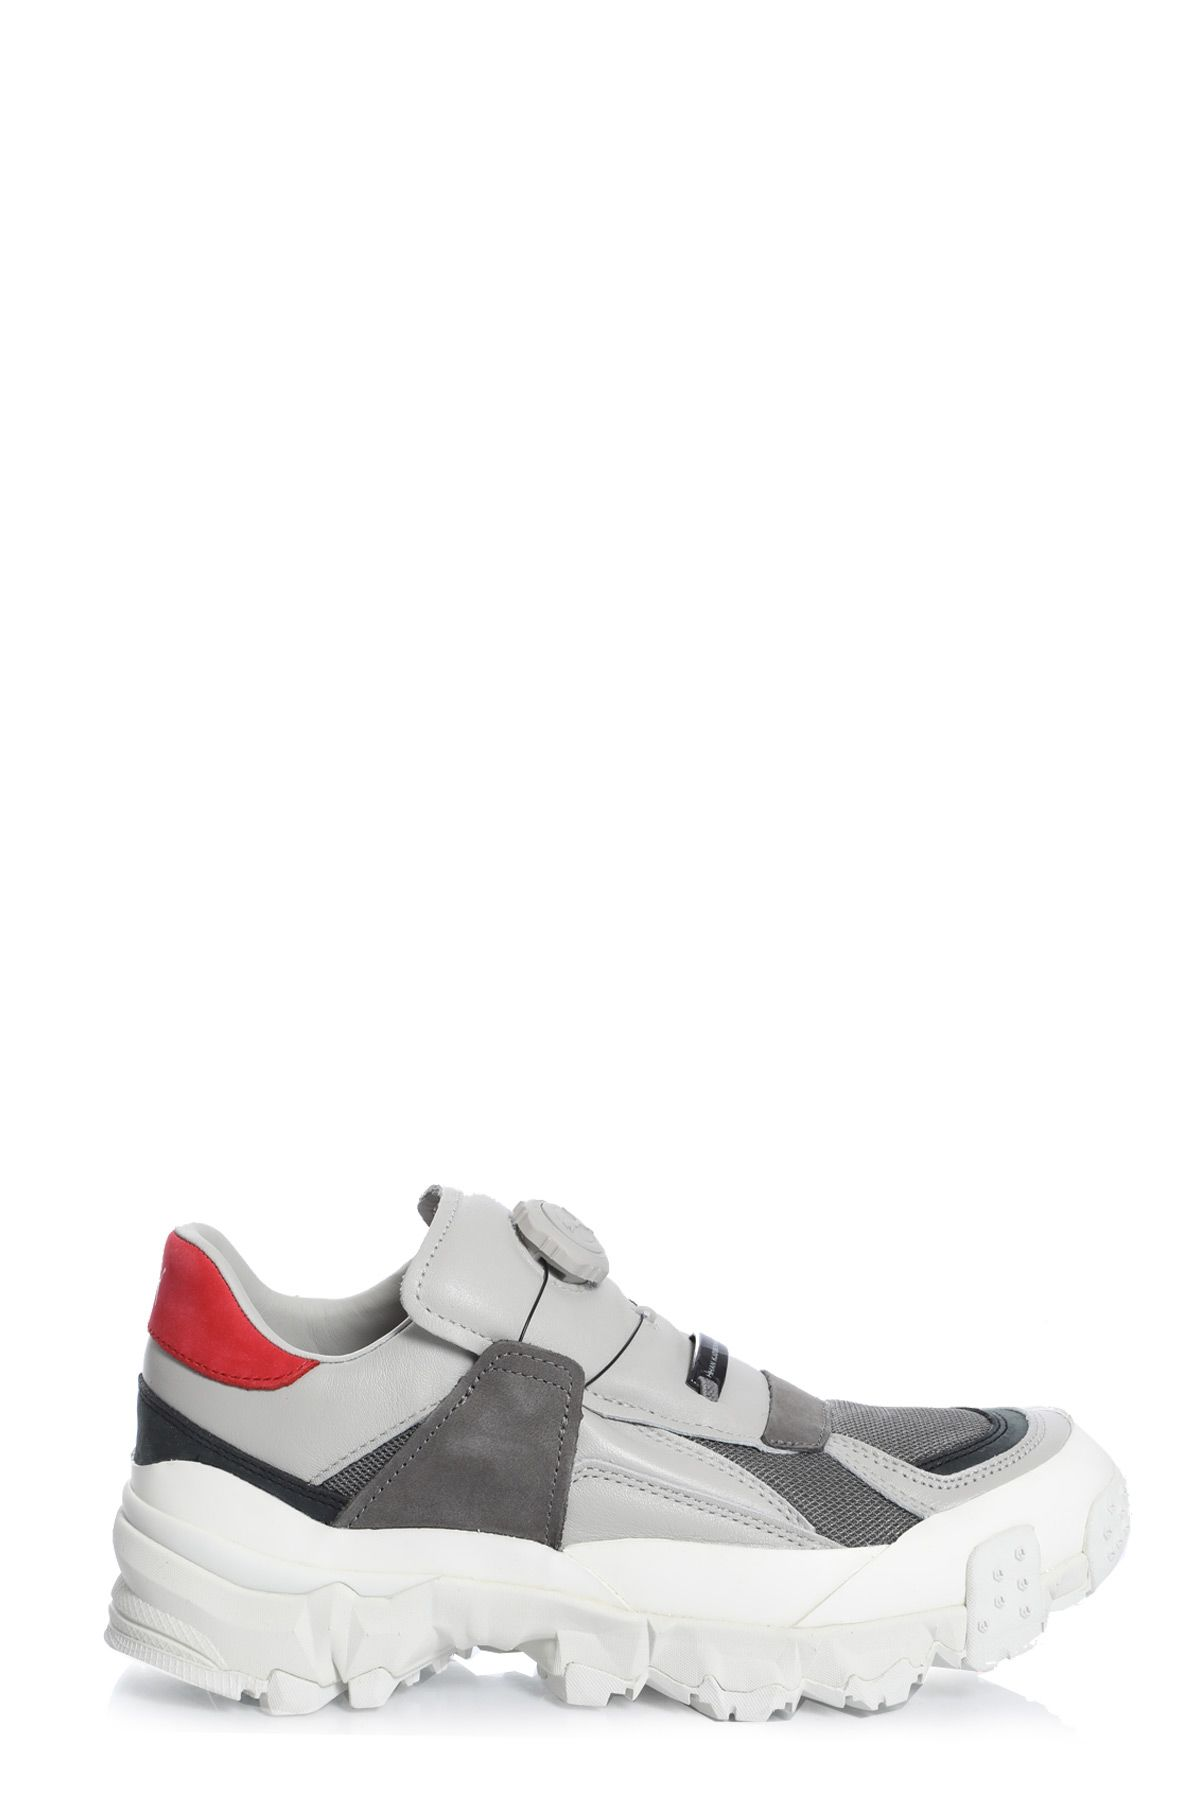 PUMA X HAN KJOBENHAVN Sneakers in Grigio/Viola